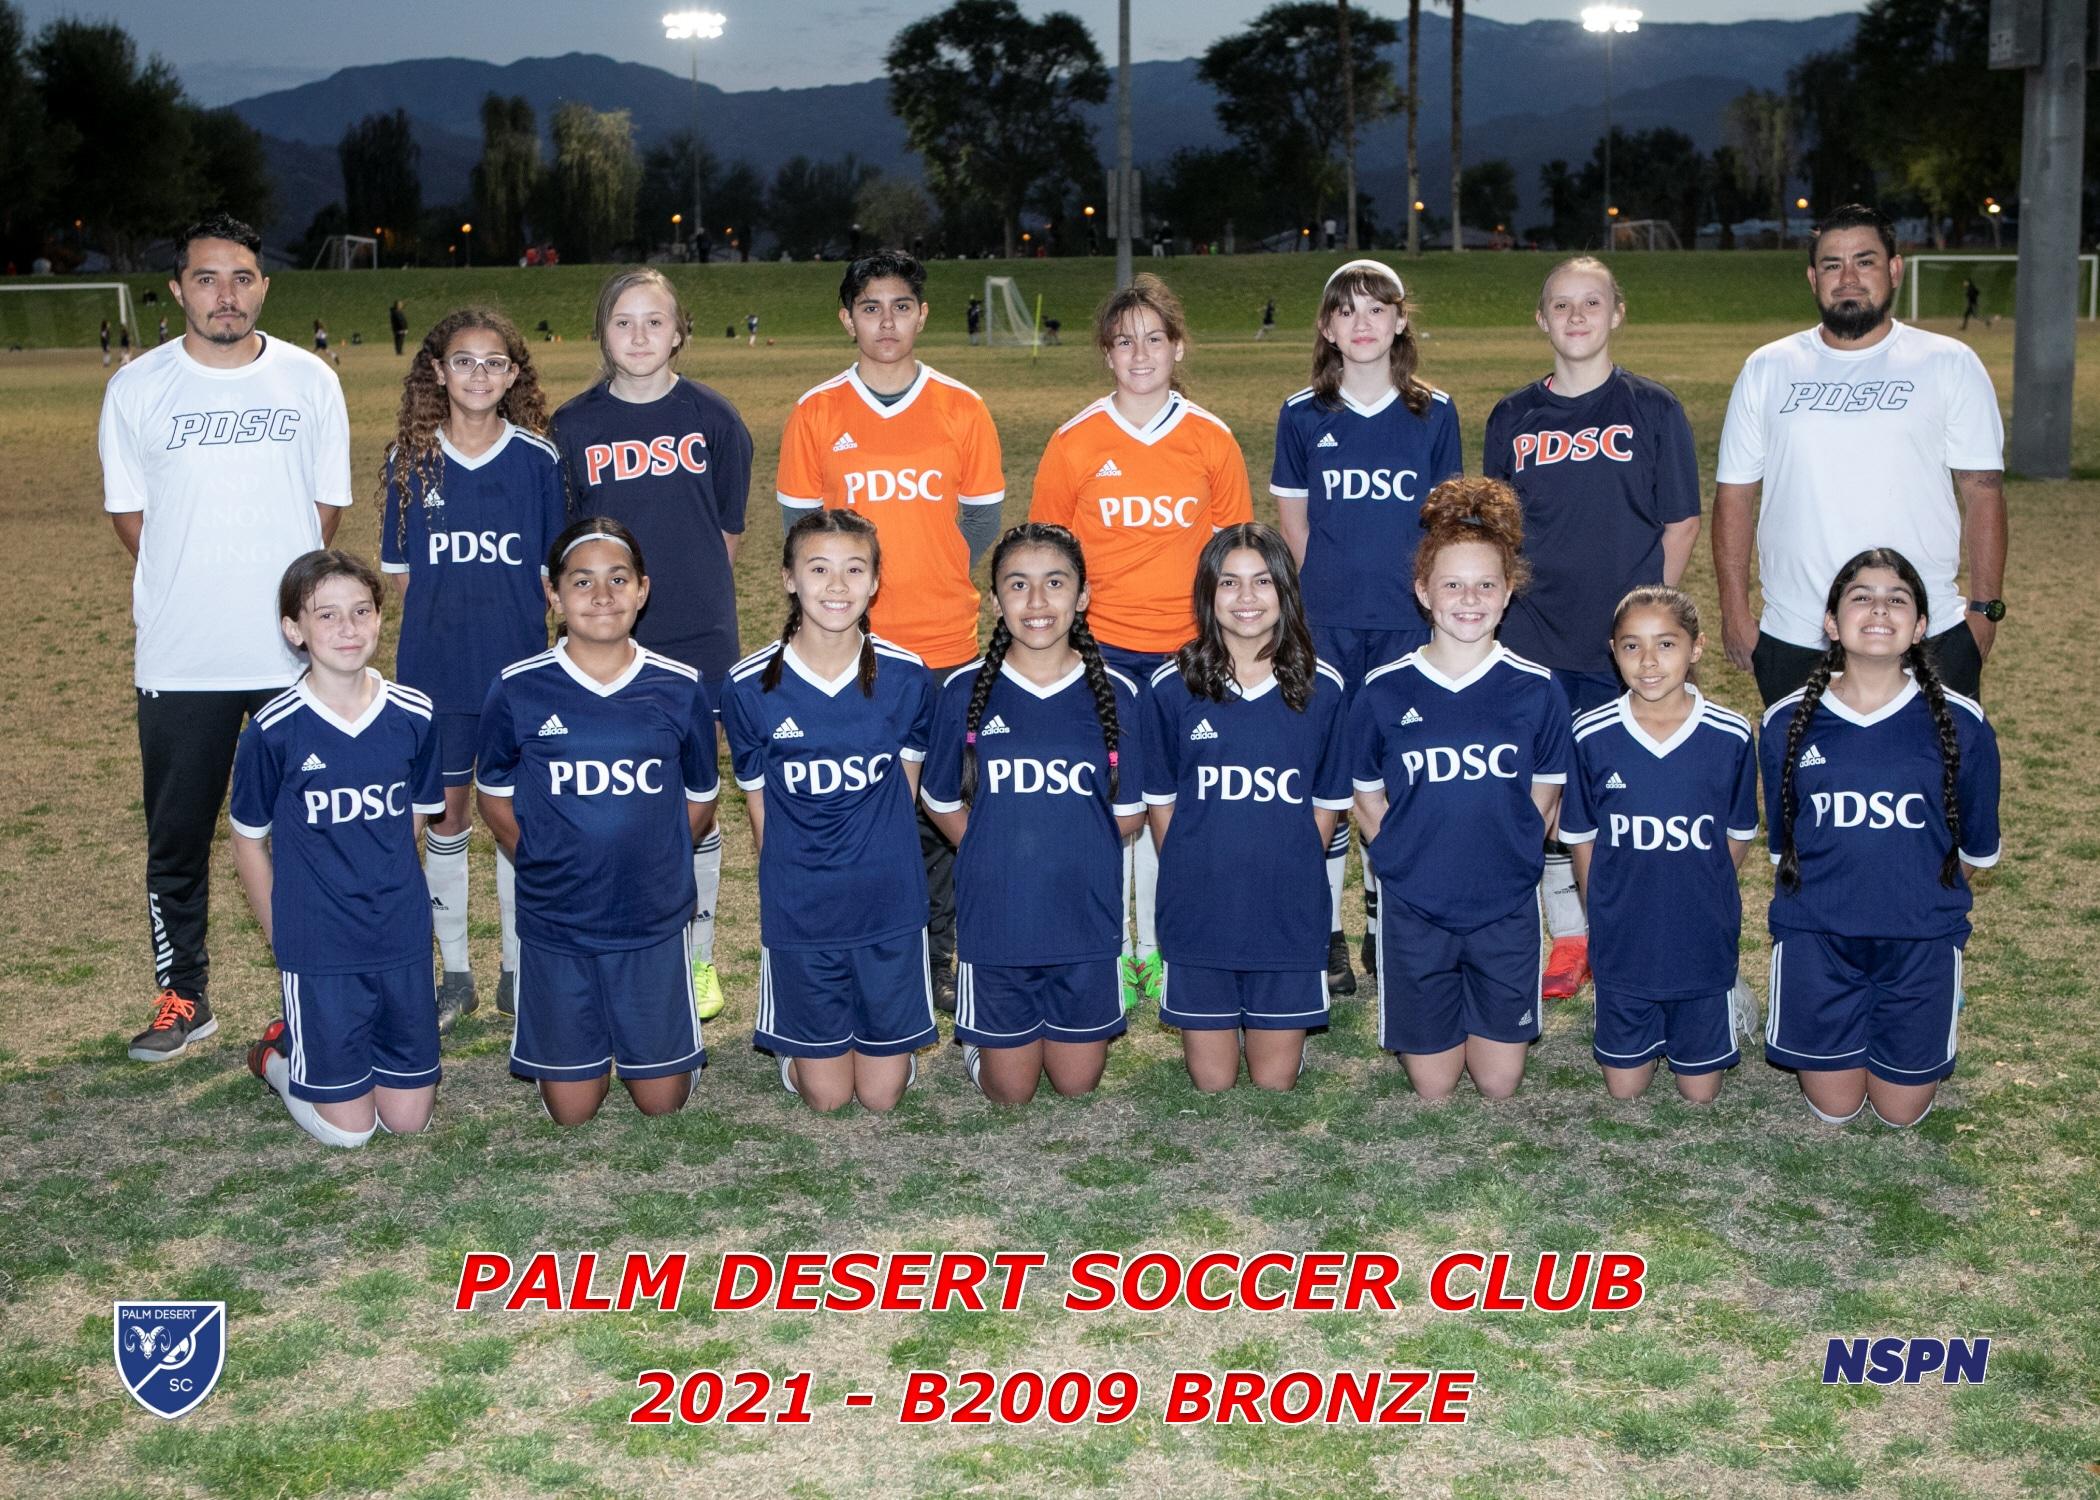 Palm Desert Soccer Club G2009 Bronze